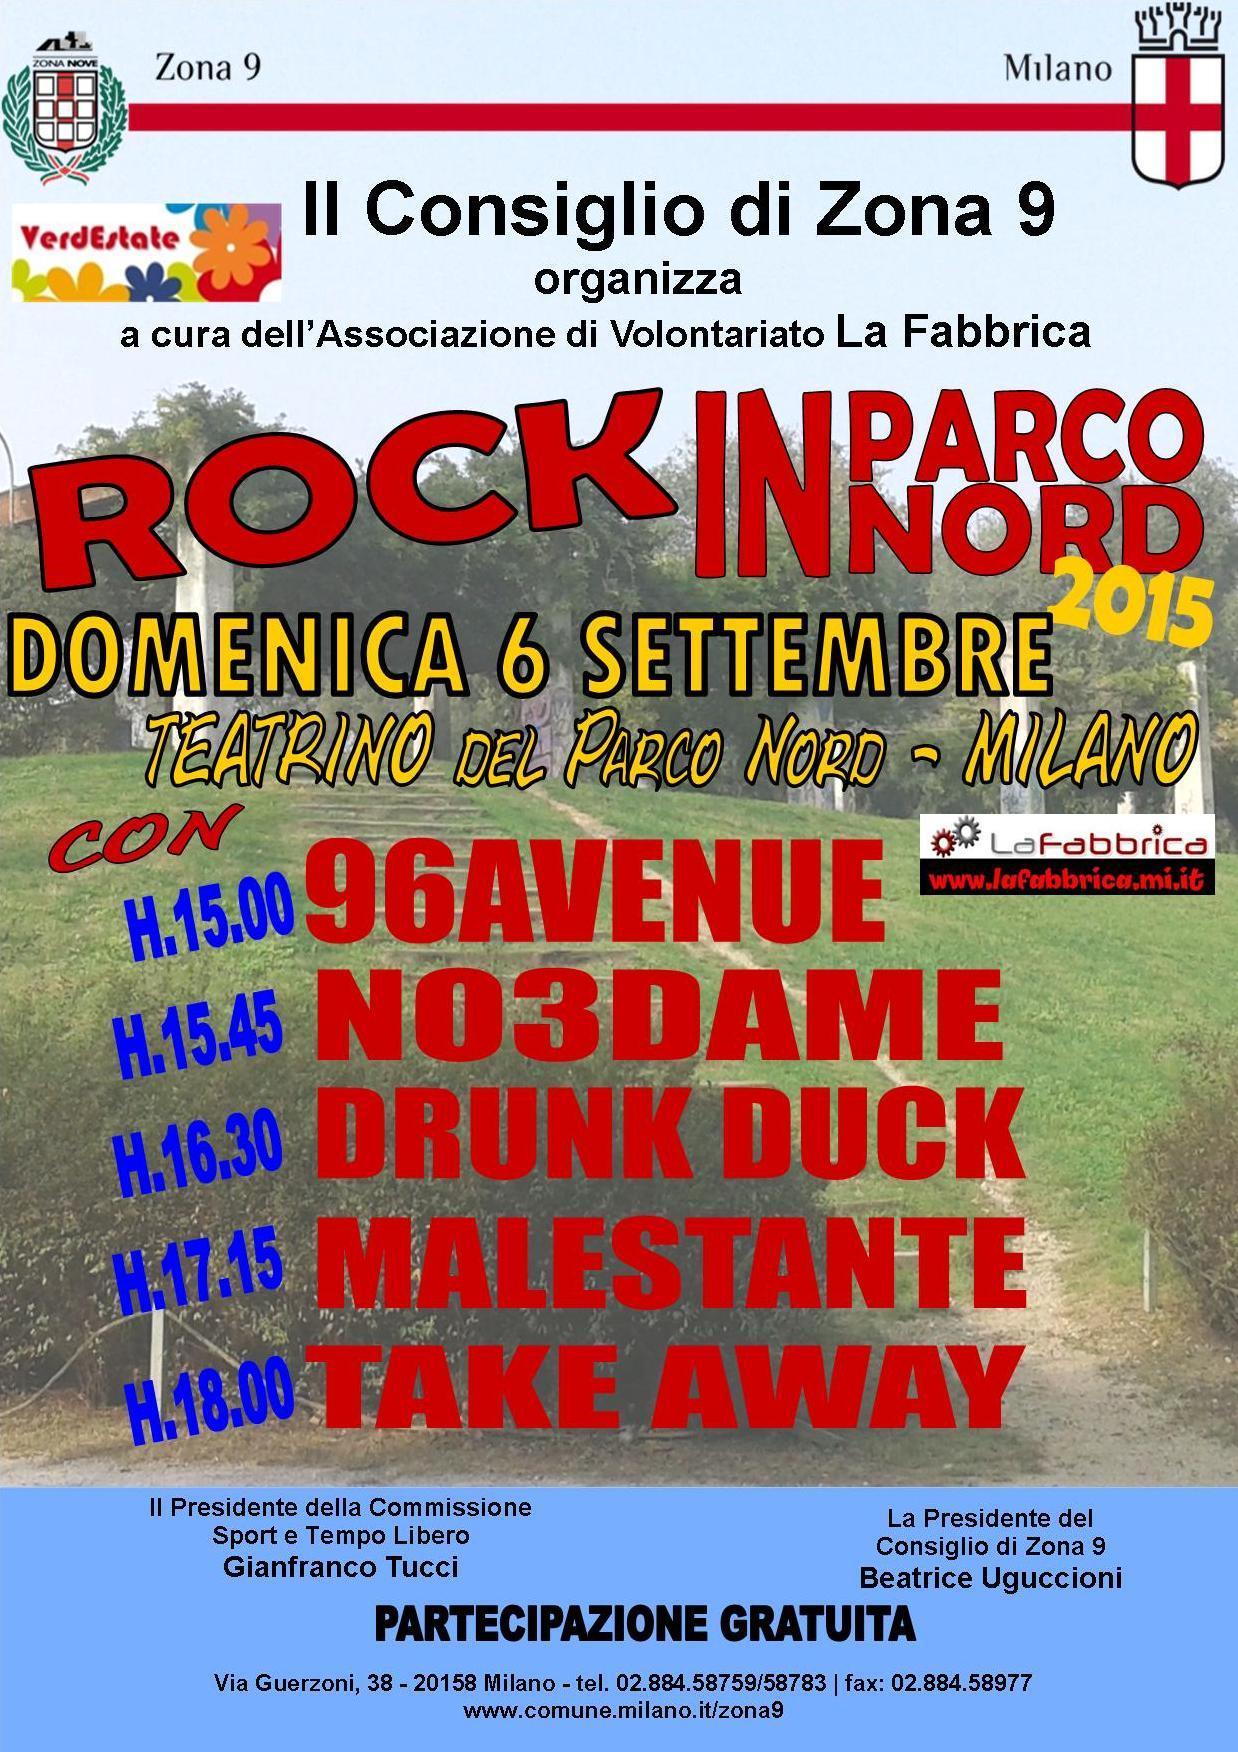 Locandina Rock in Parco Nord 2015 definitiva